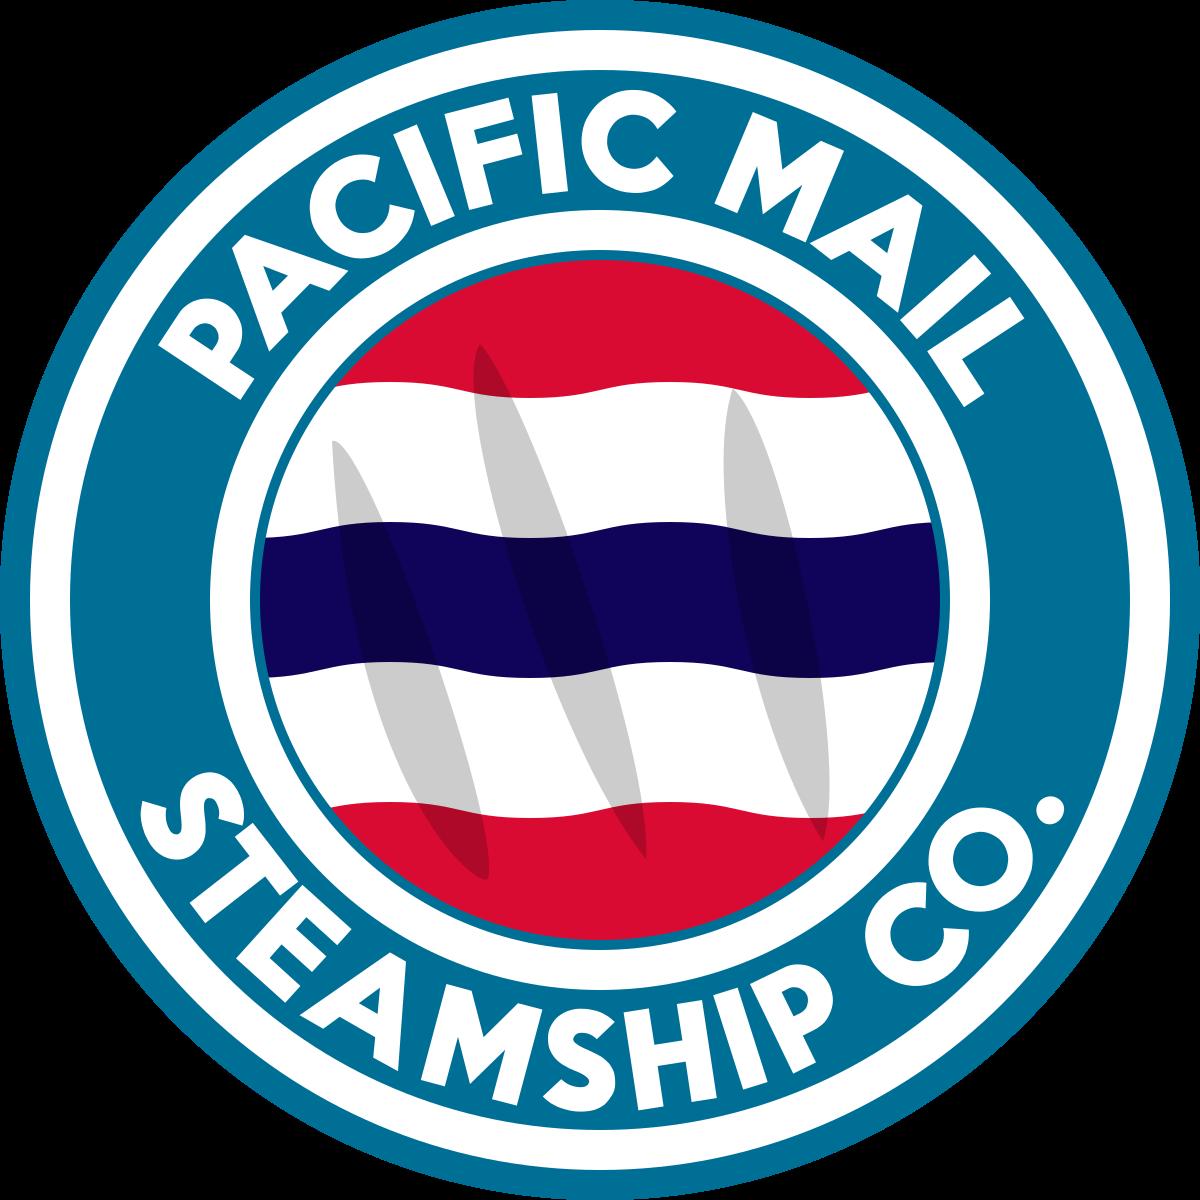 Pacific mail steamship company. Cruise clipart steam ship